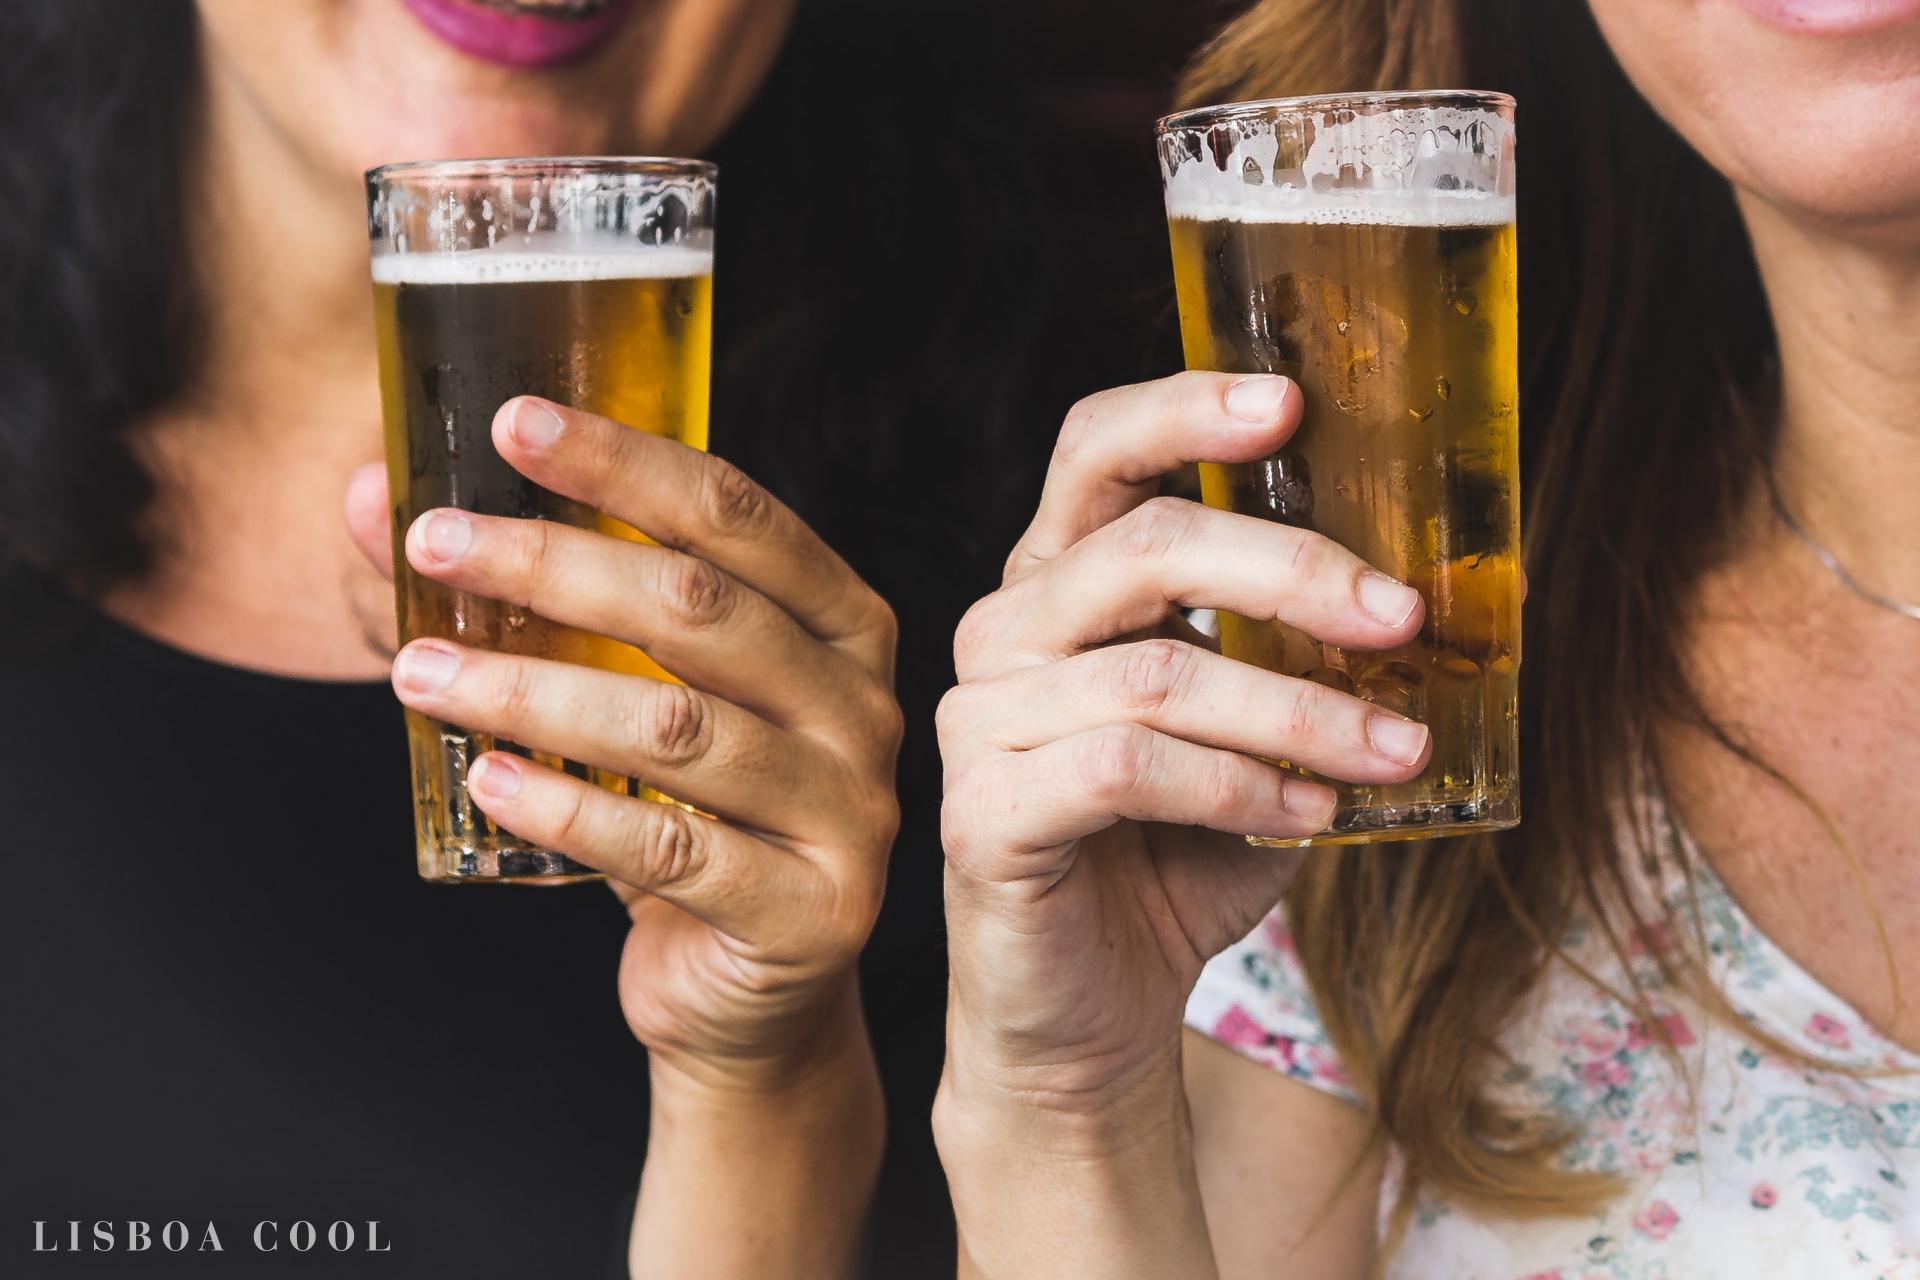 LC_Comer_#BeerAtHome - alinha?